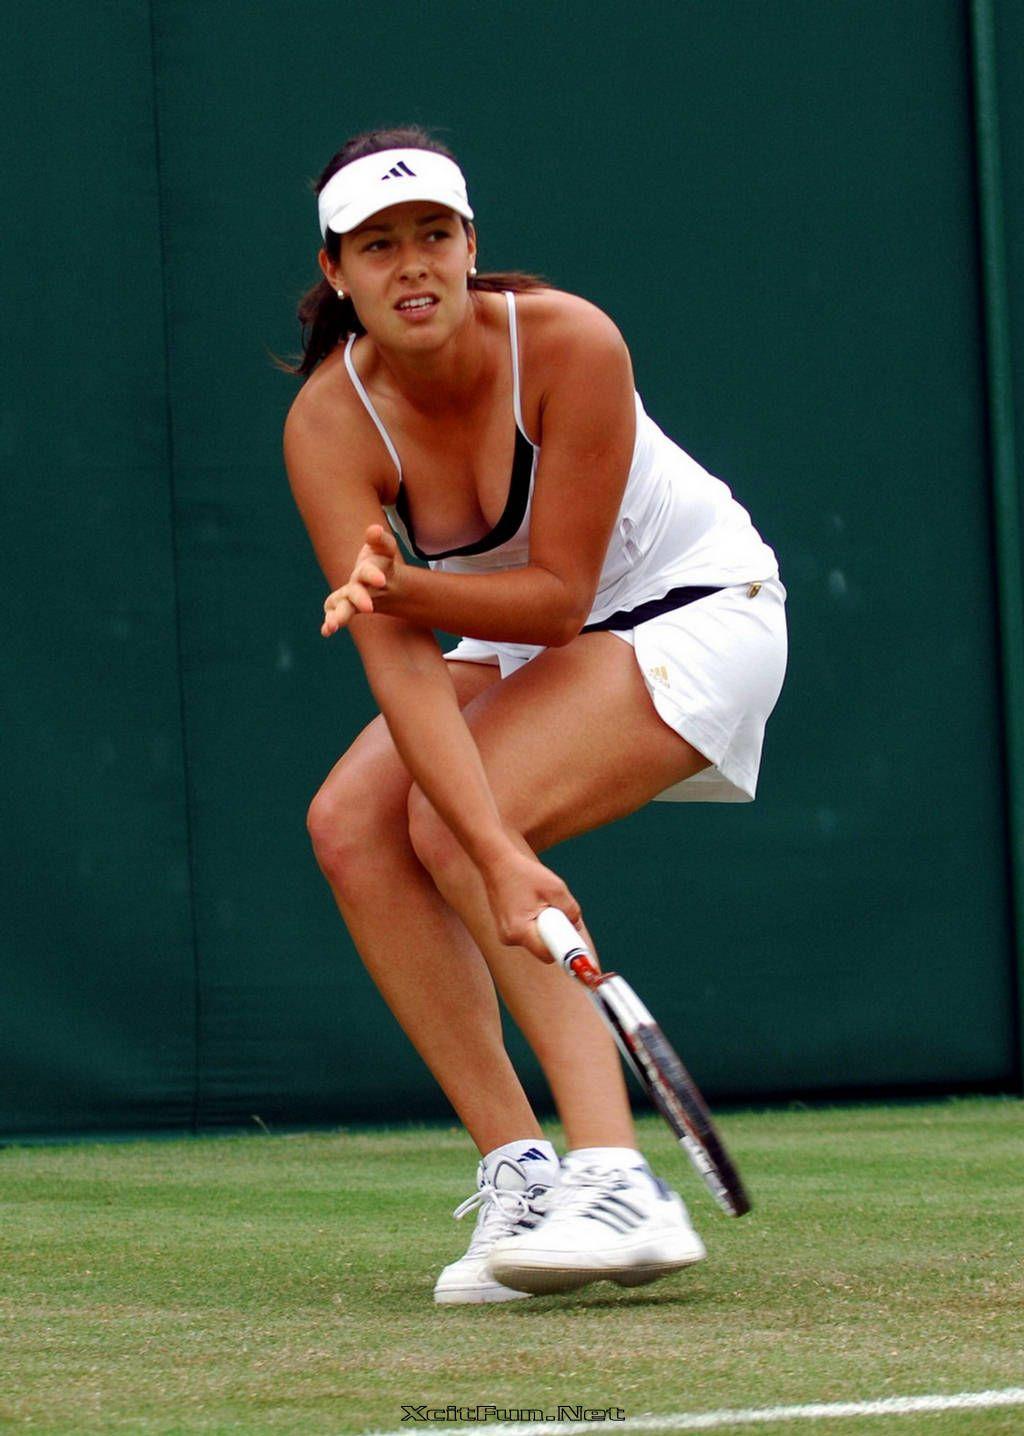 Ana Ivanovic Nude Pics ana ivanovic wimbledon 2008 top seed top down hq pictures